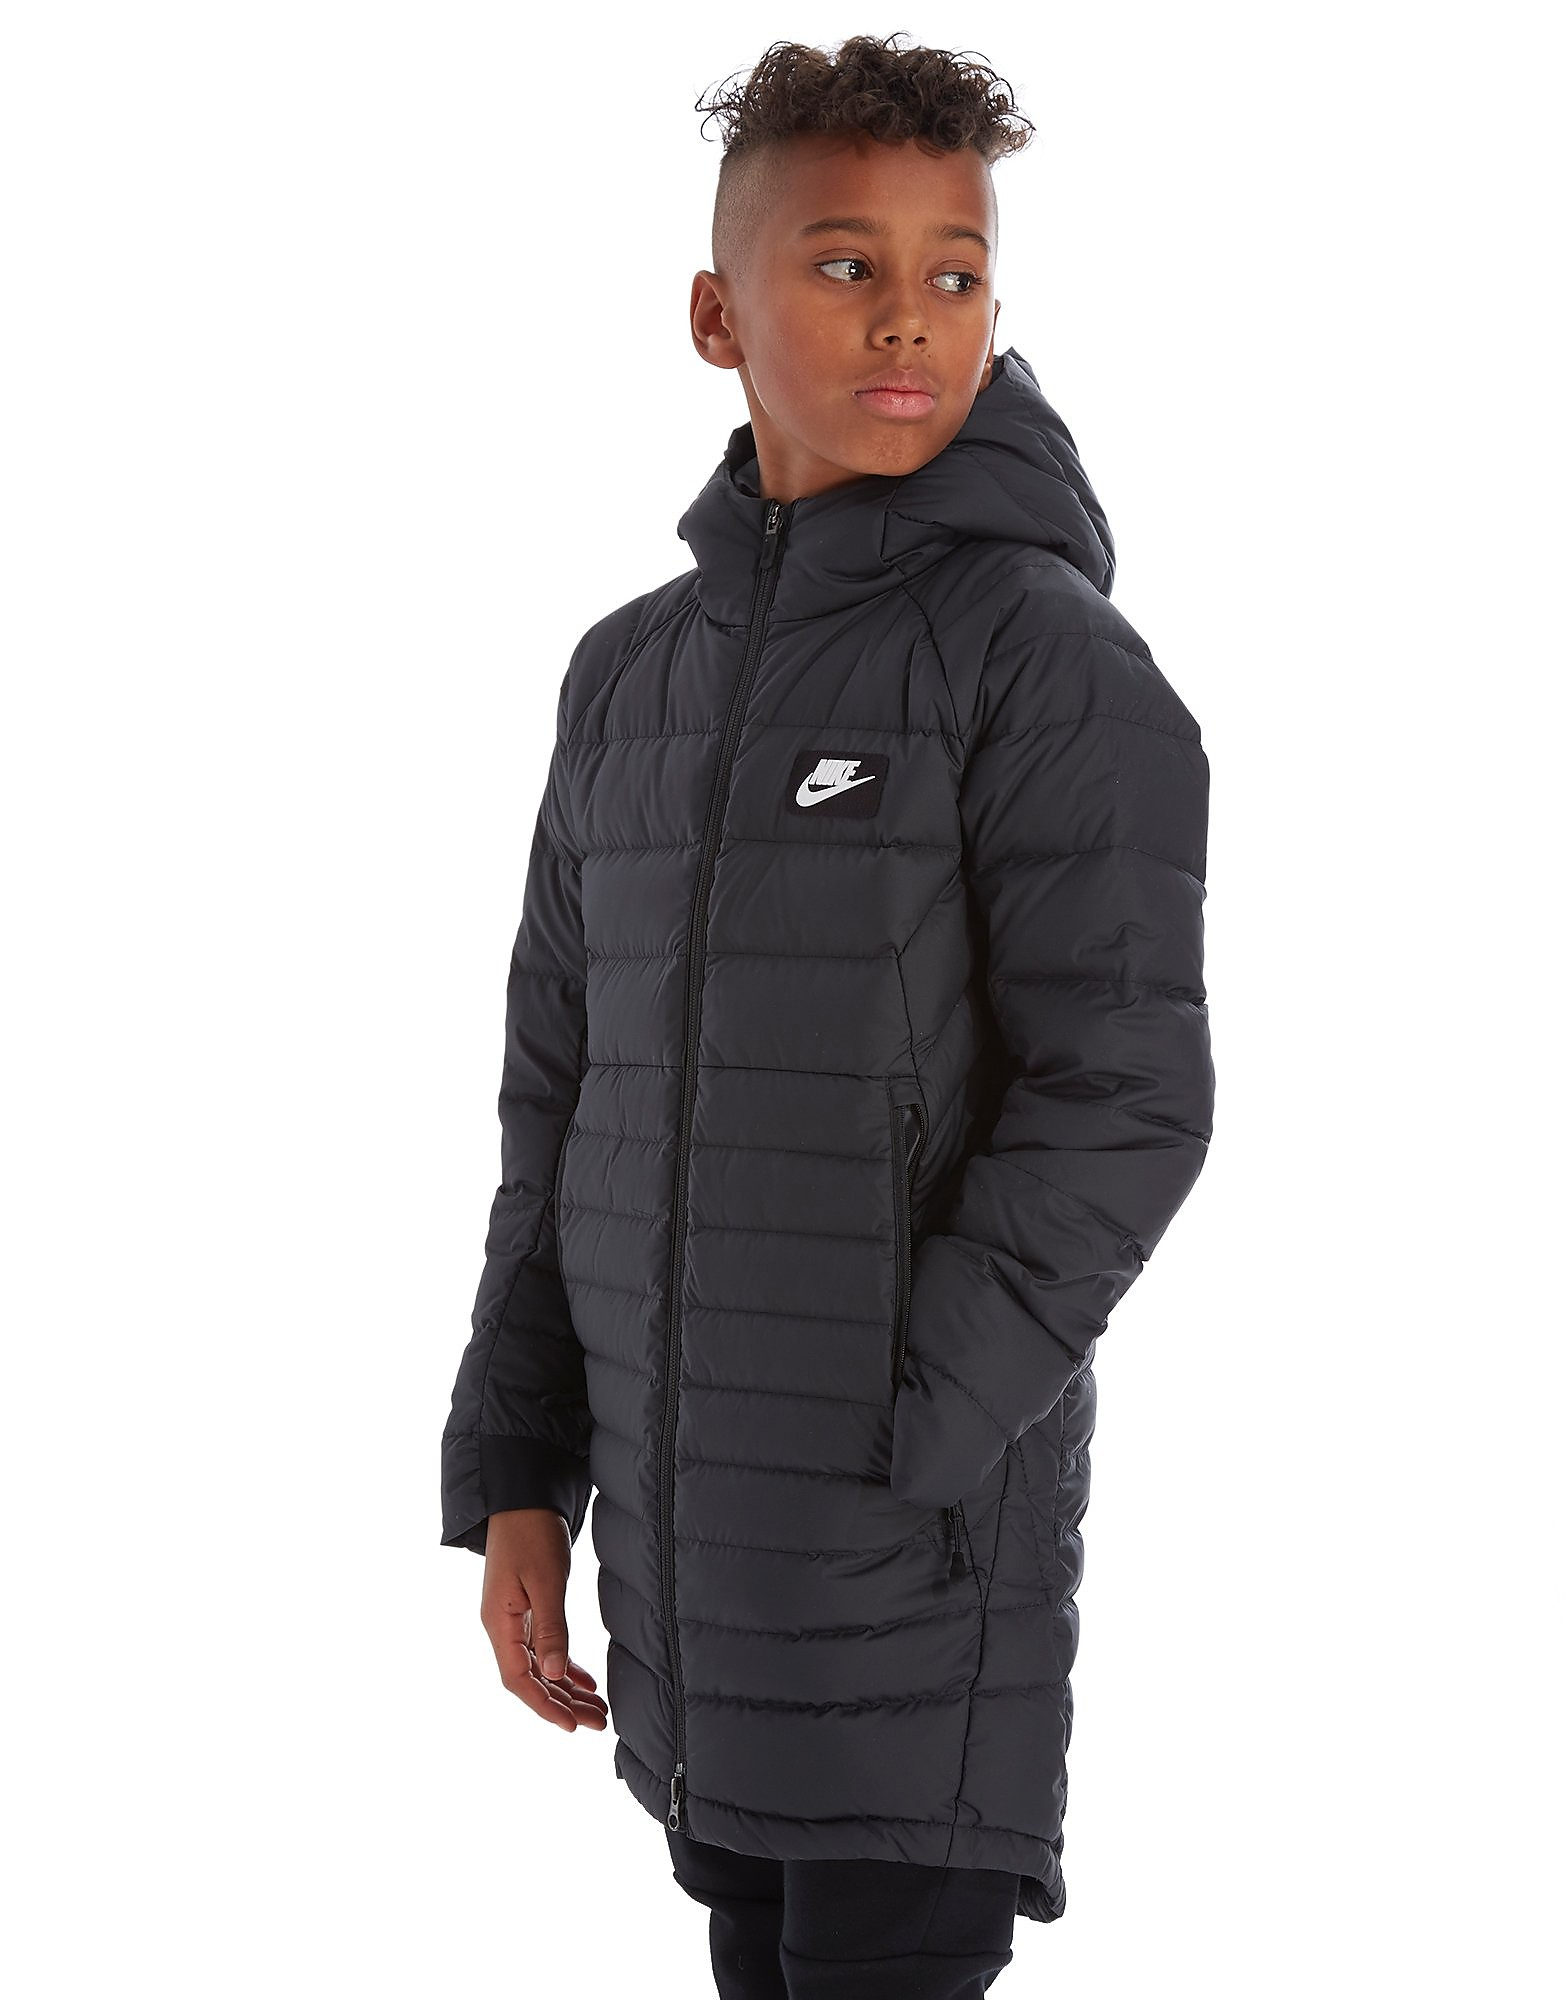 Nike Veste Parka Padded Junior